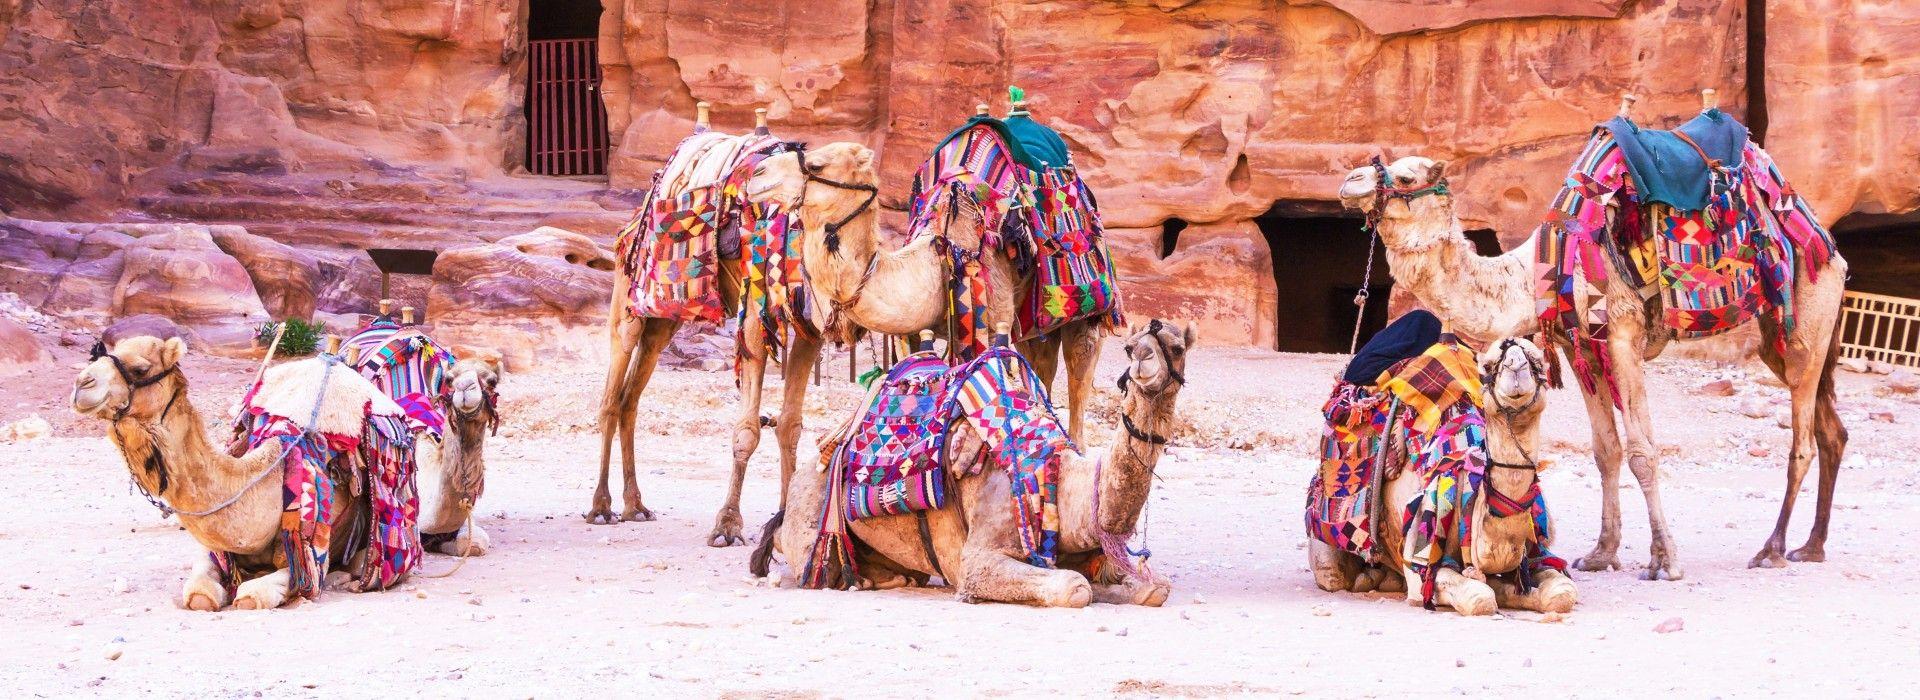 Adventure tours in Jordan